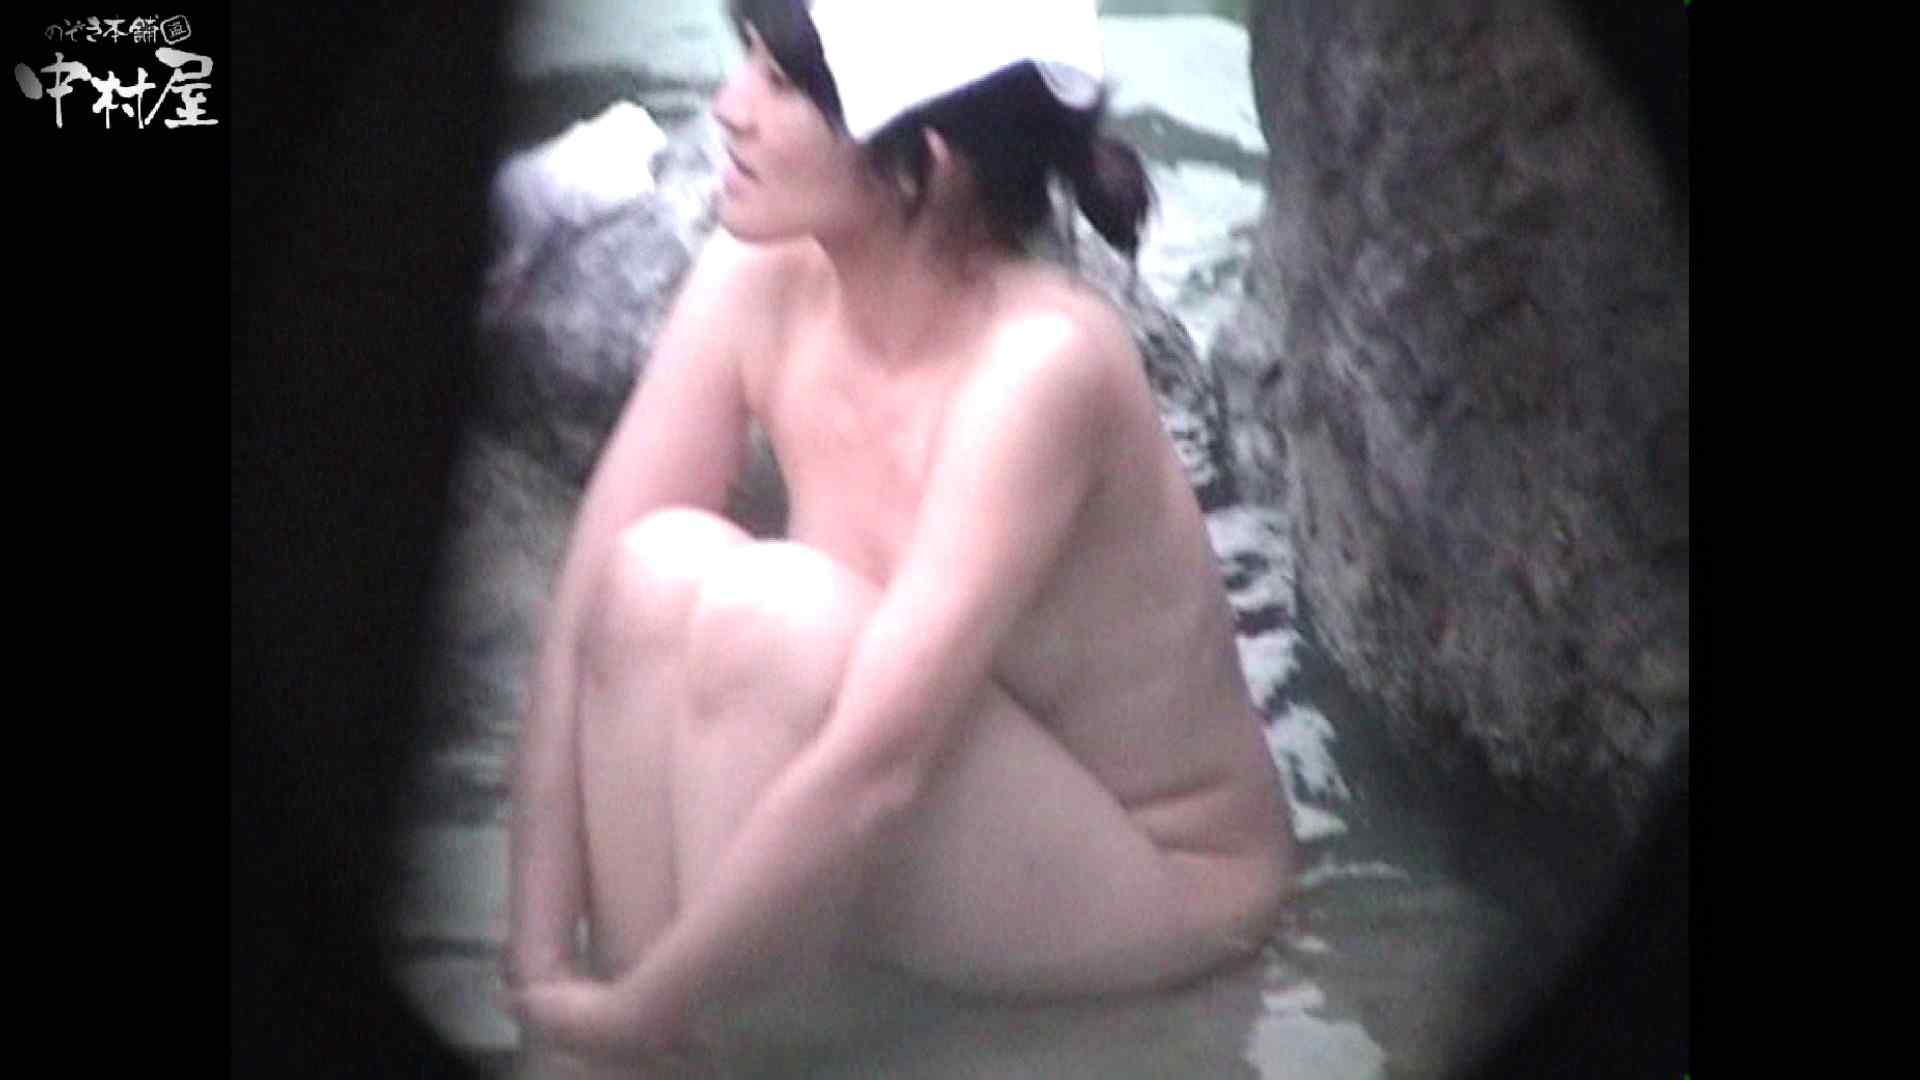 Aquaな露天風呂Vol.952 OLのエロ生活 おまんこ動画流出 106連発 101